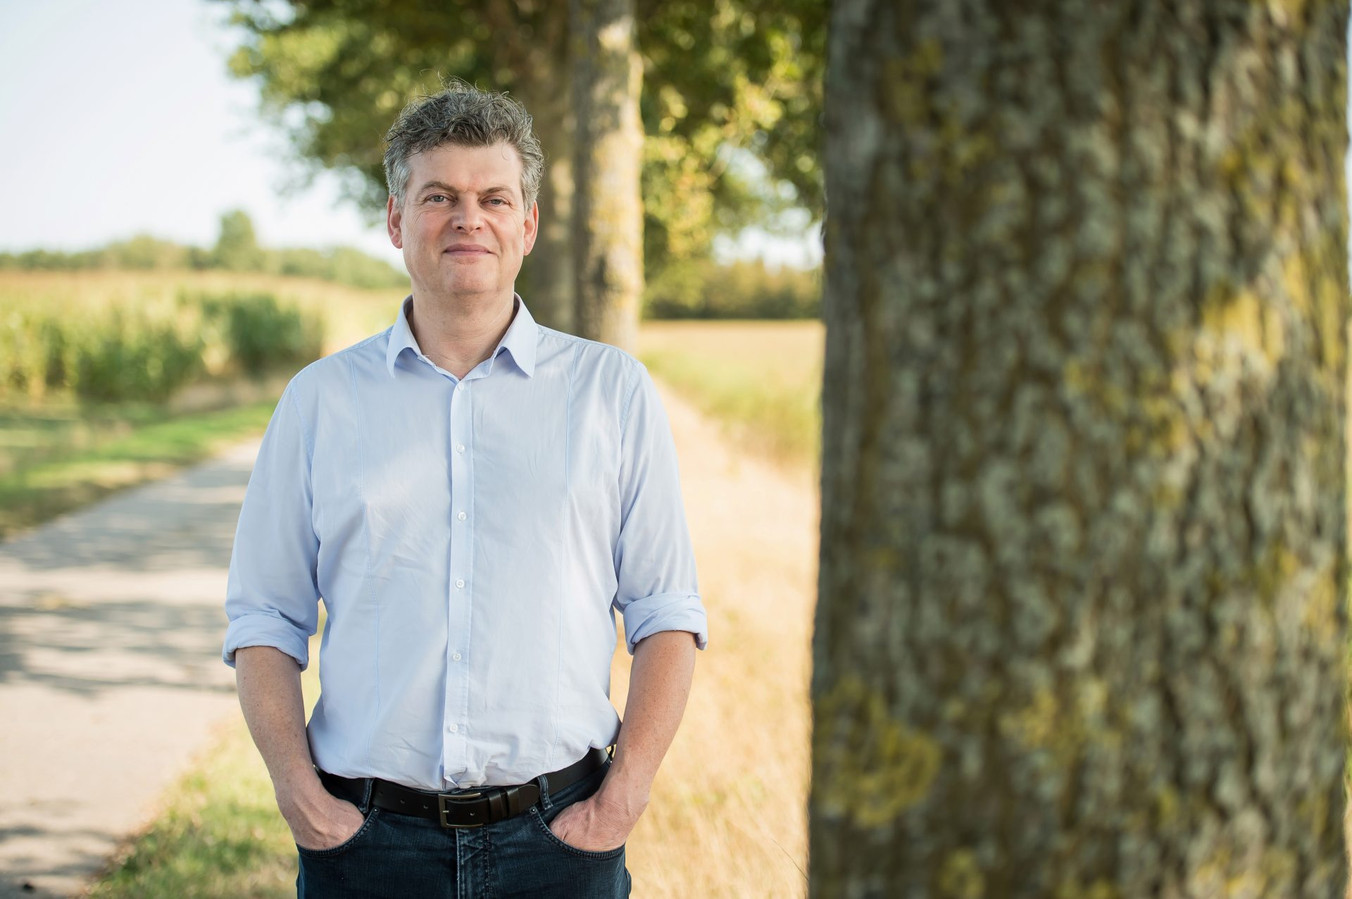 Bart Van Hulle, de burgemeester van Maldegem.